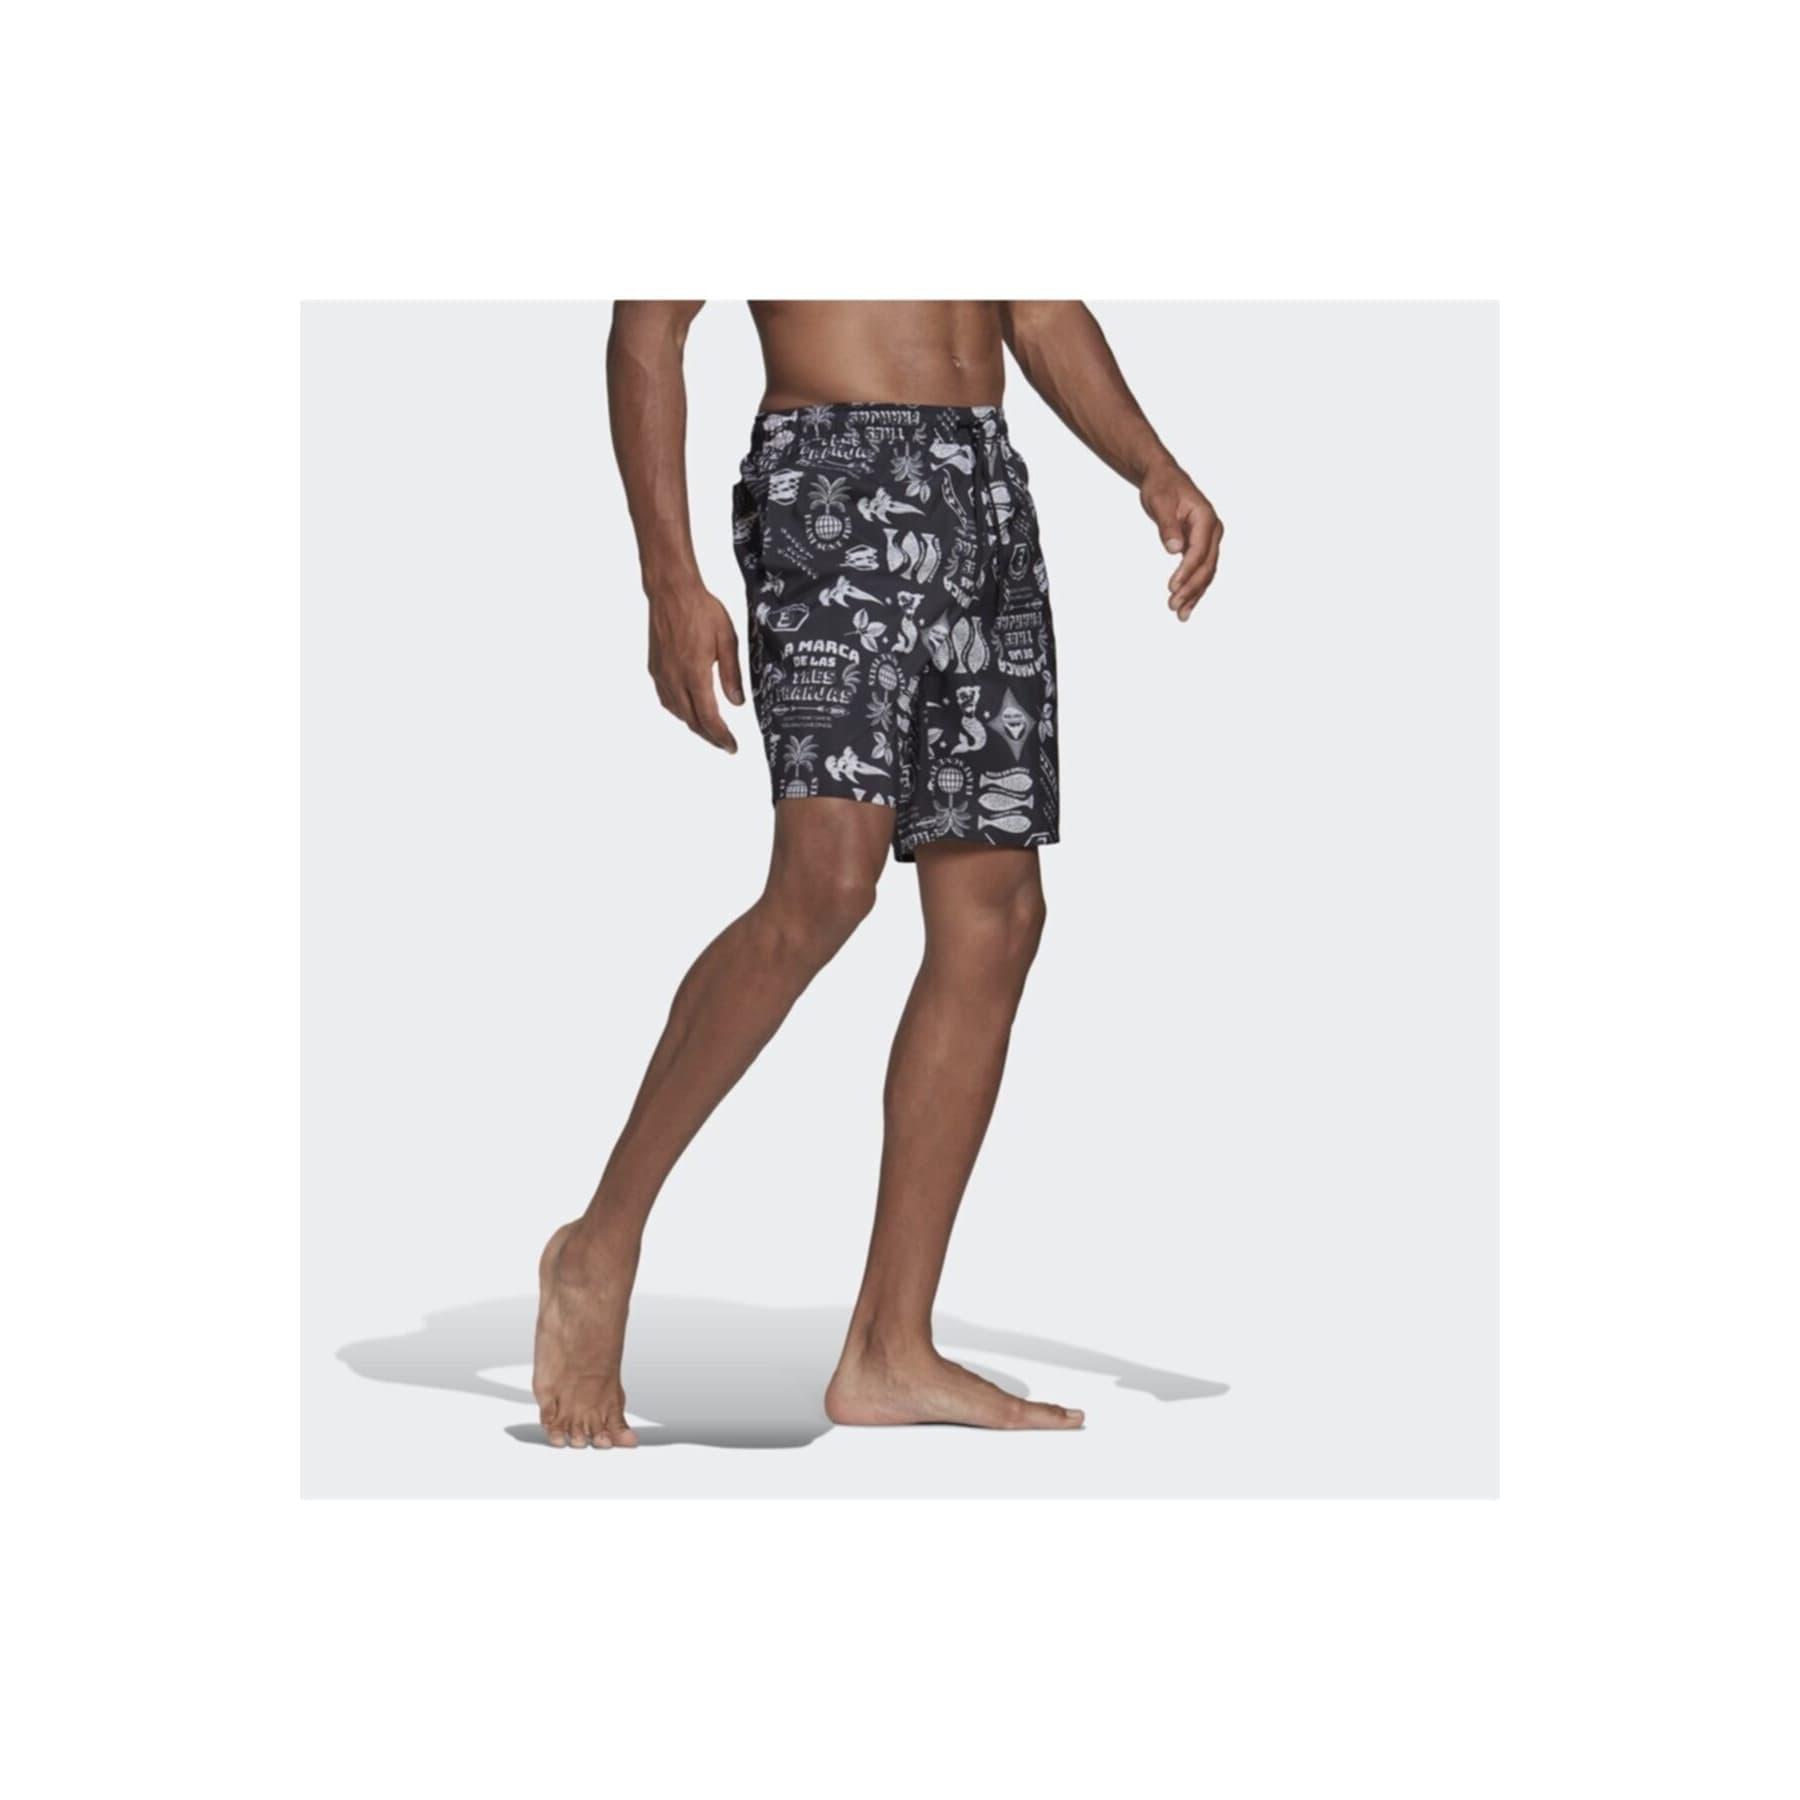 Classic-Length Graphic Erkek Siyah Şort Mayo (GM2226)